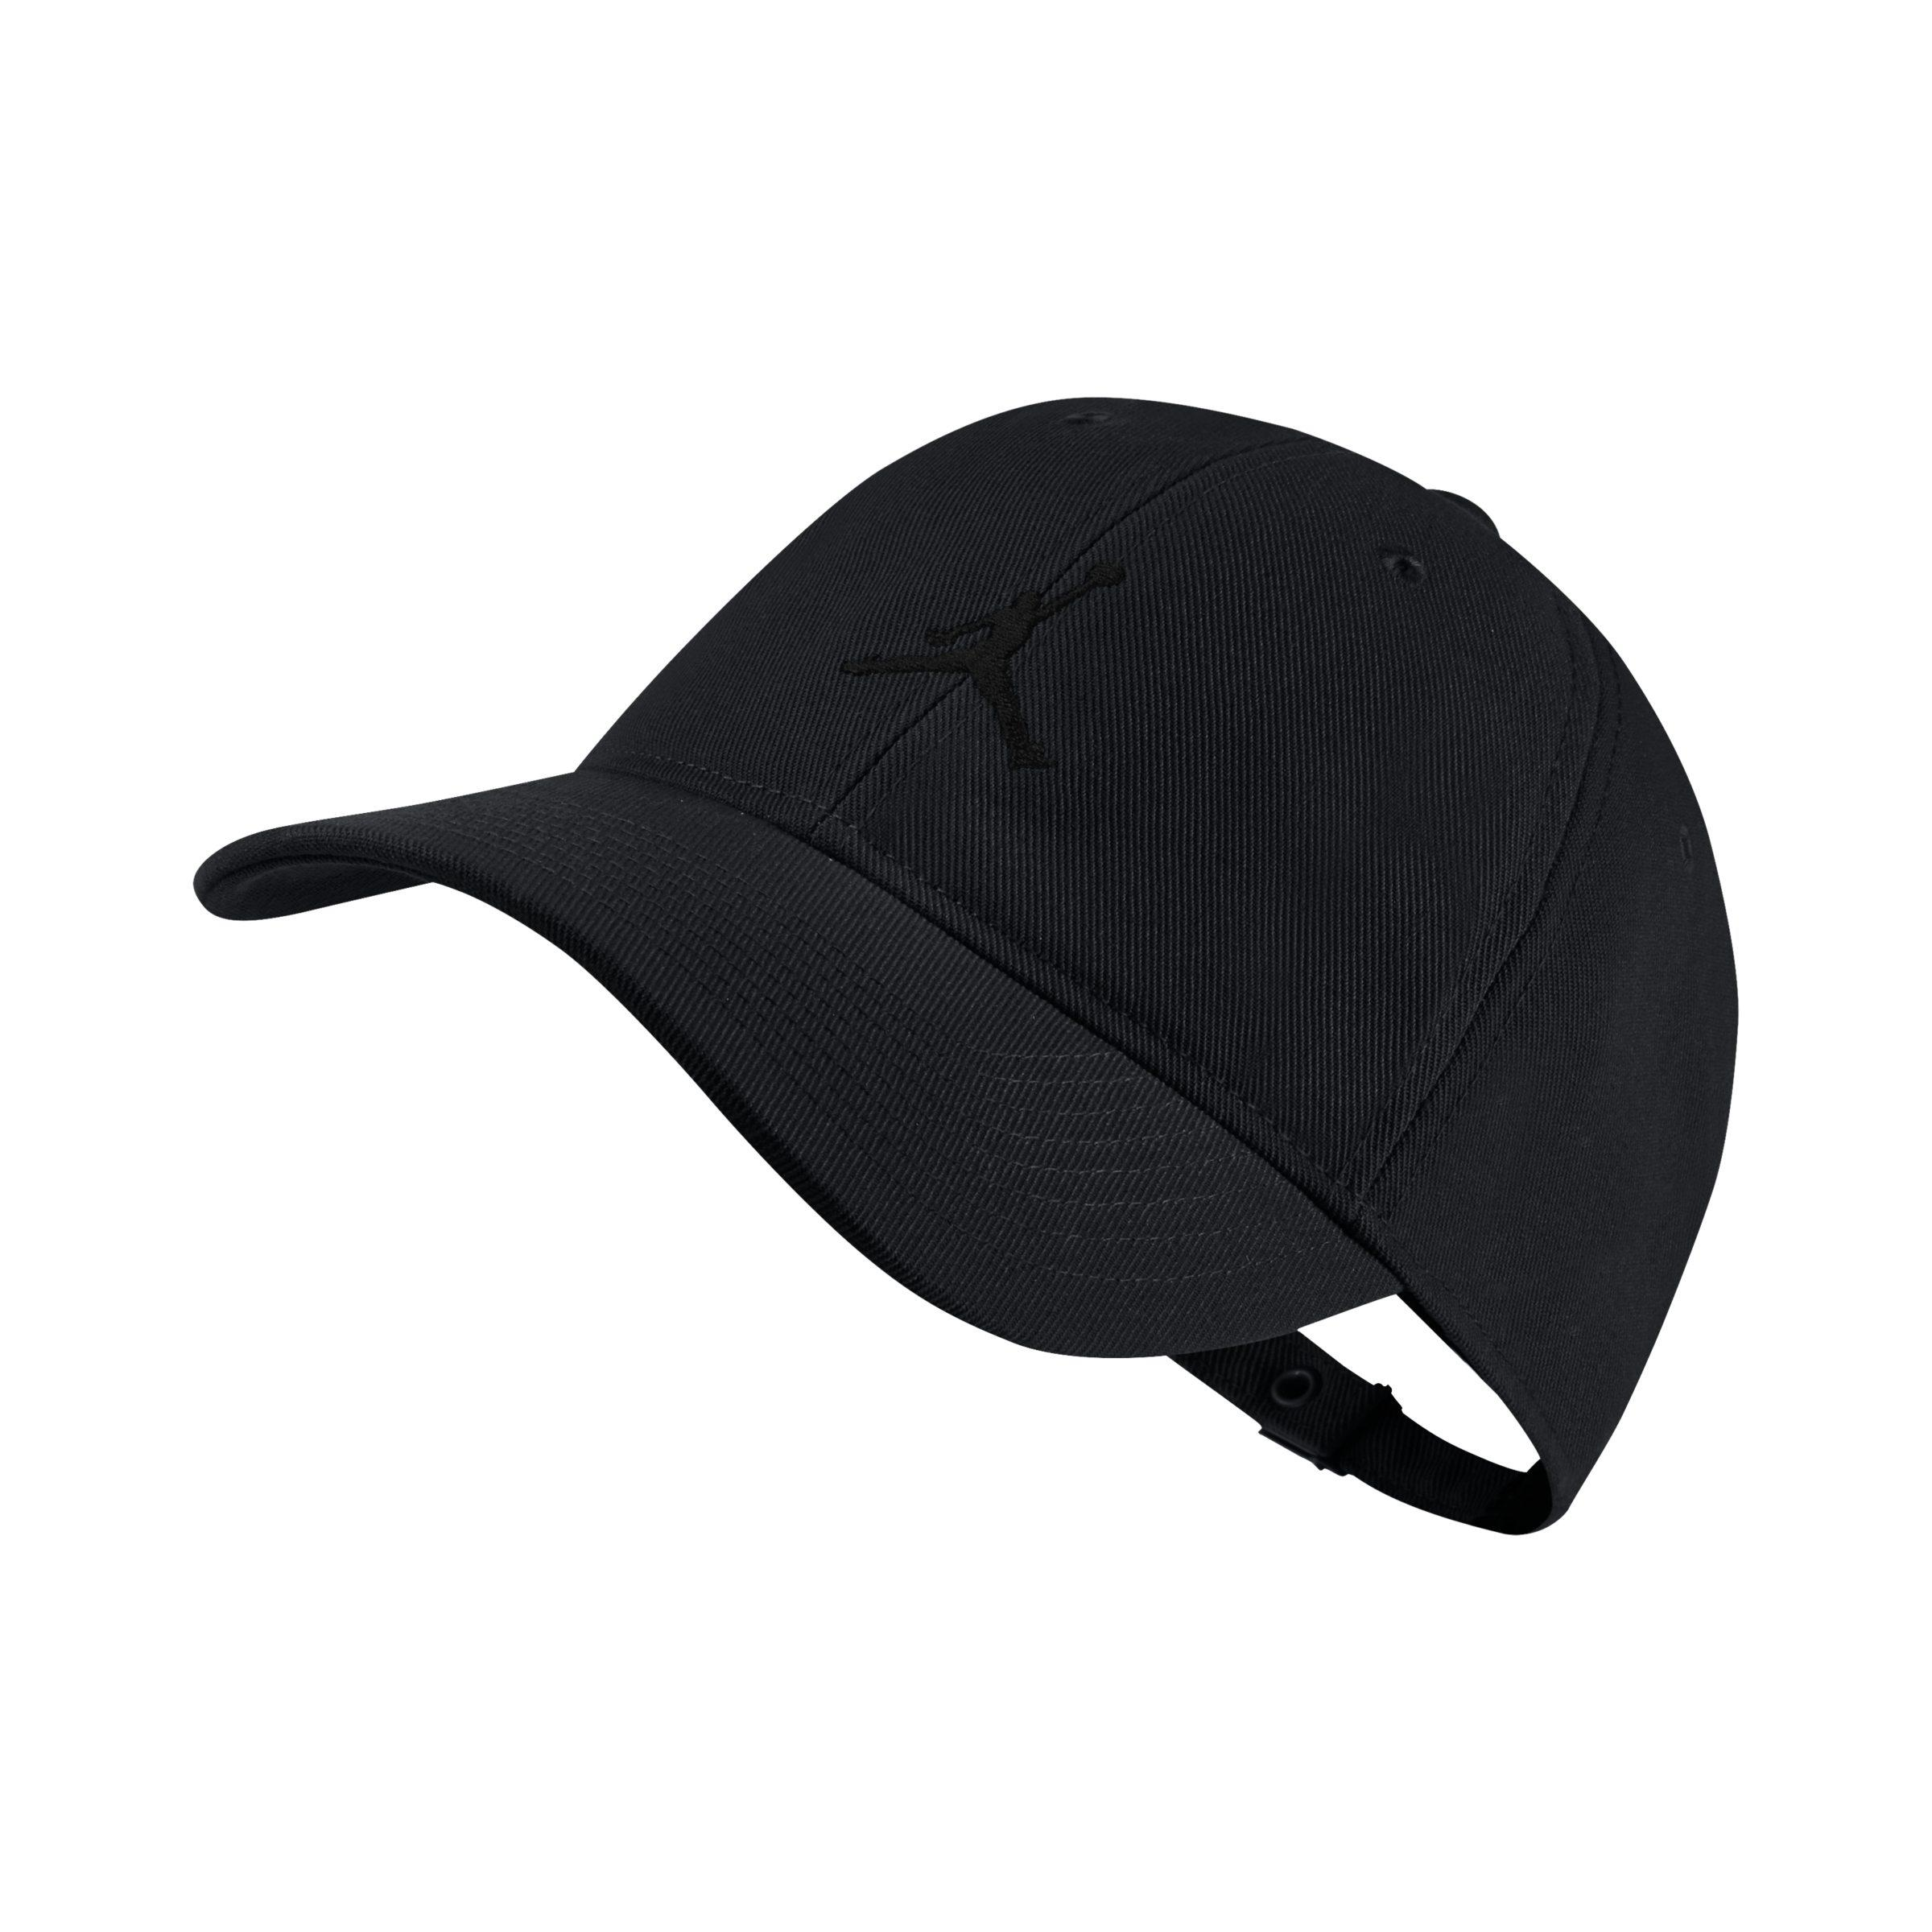 4cd5c3e46f19 Nike Jordan Jumpman H86 Adjustable Hat in Black for Men - Lyst